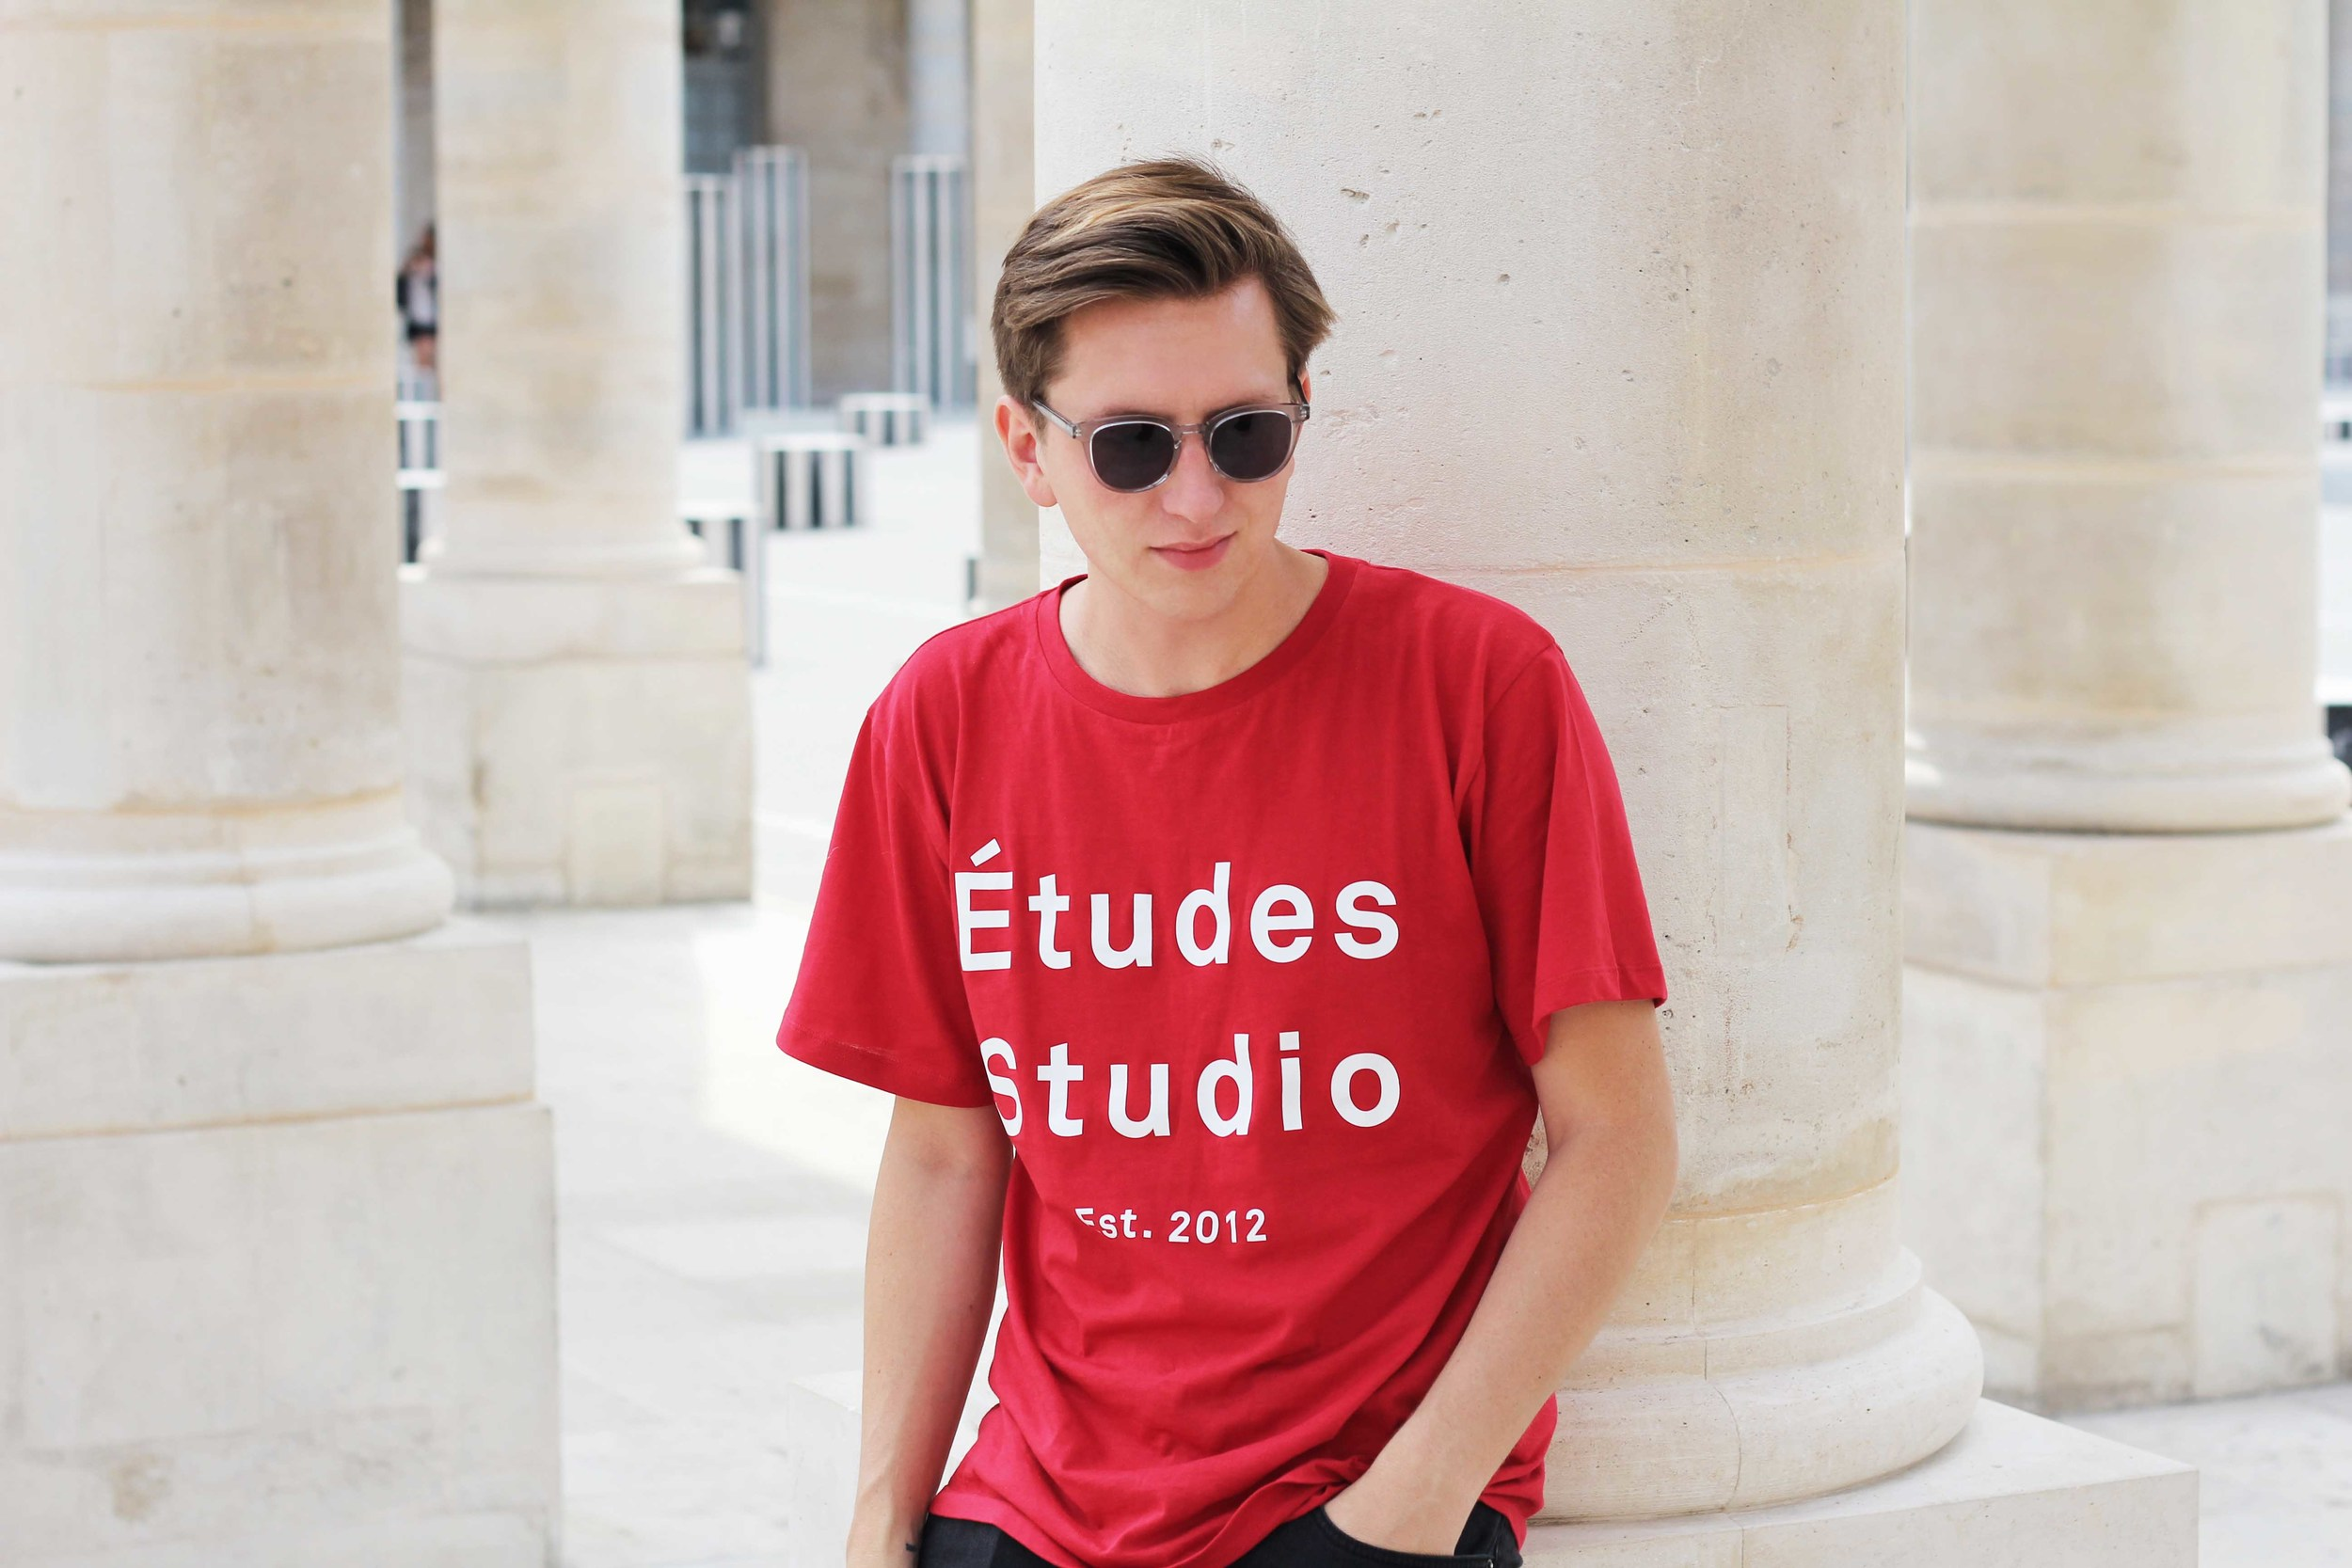 etudes_studio_paris_menswear_ootd